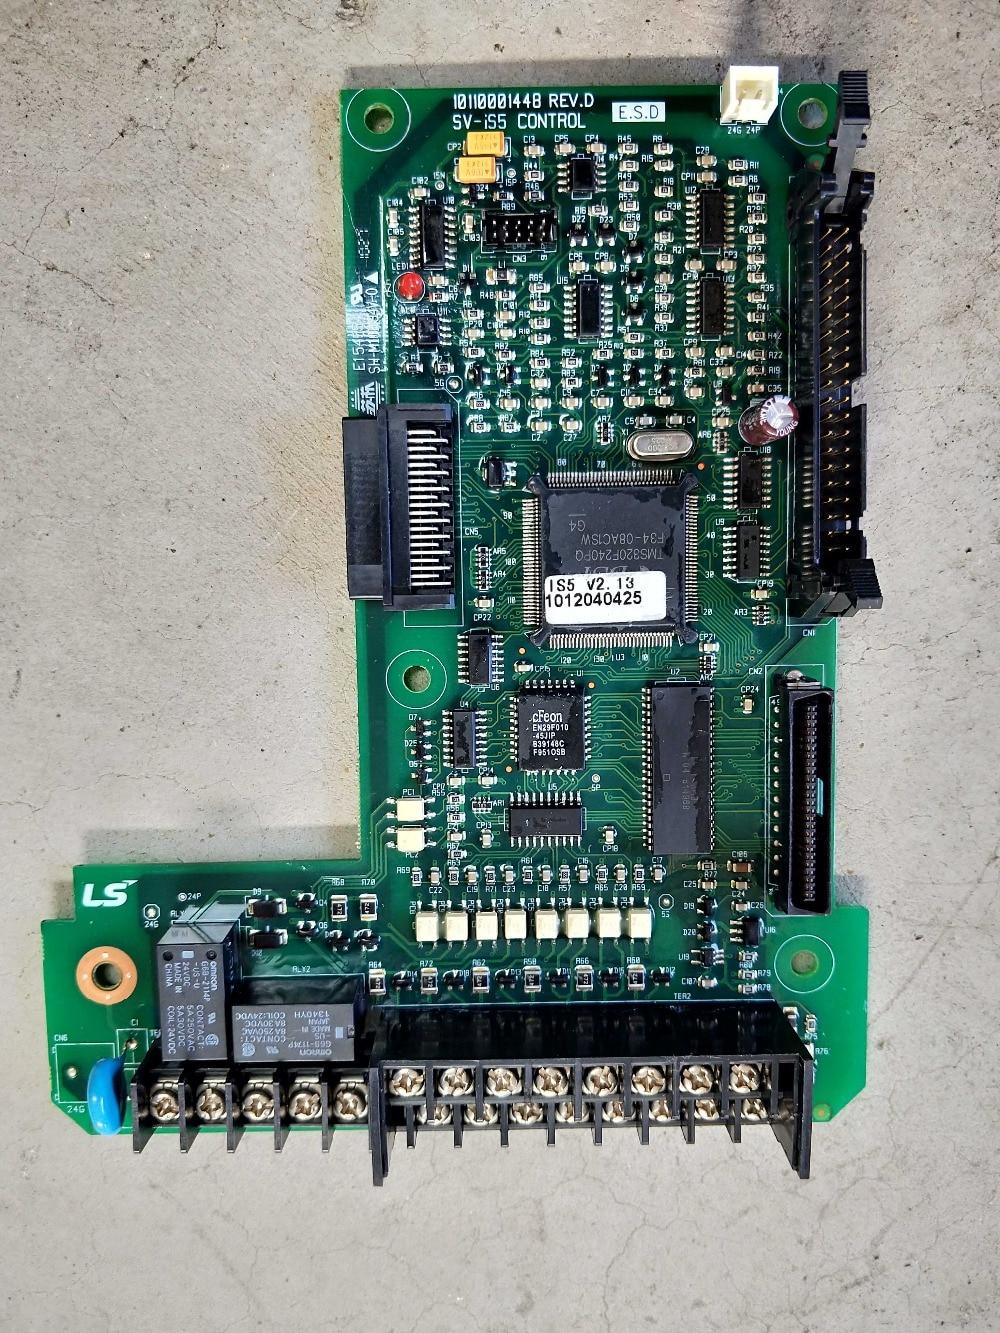 10110001448 REV.D REV.E REV2.1 REV 2.0SV IS5 Good Working Tested|  - title=